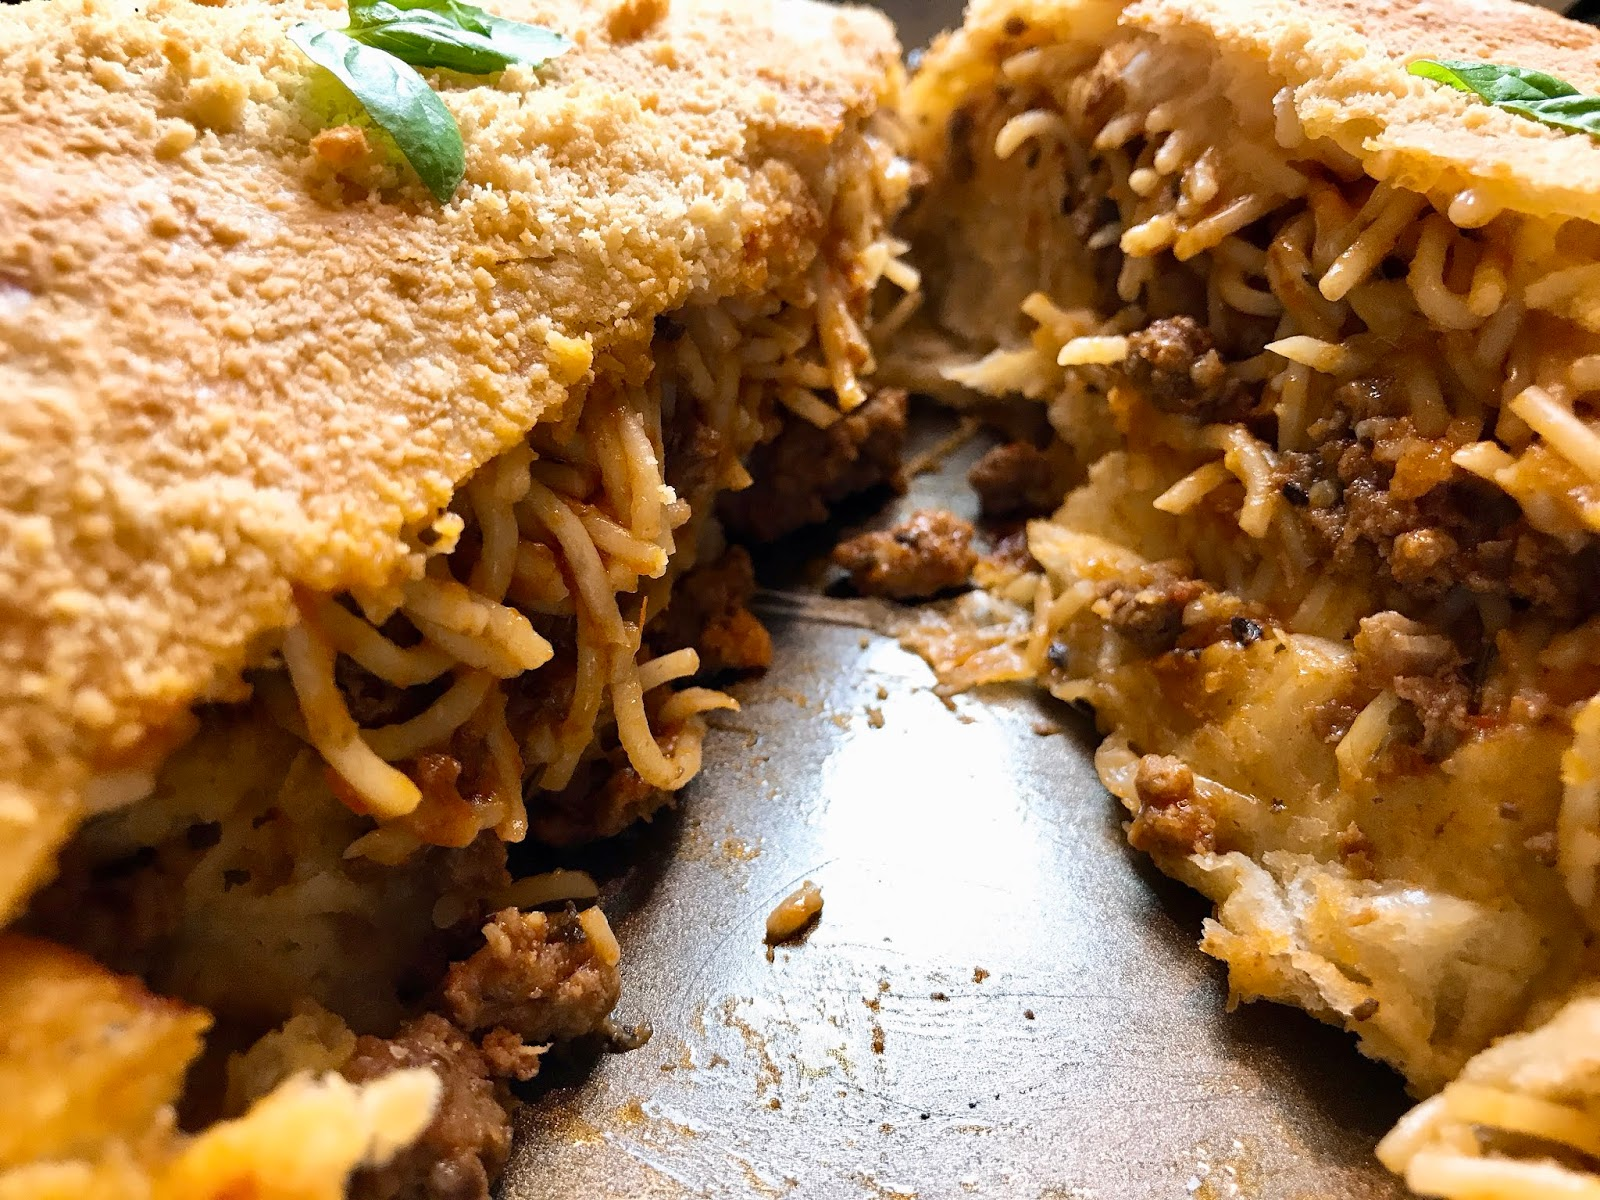 Spaghetti Bolognese Calzone-Stuffed Pizza-